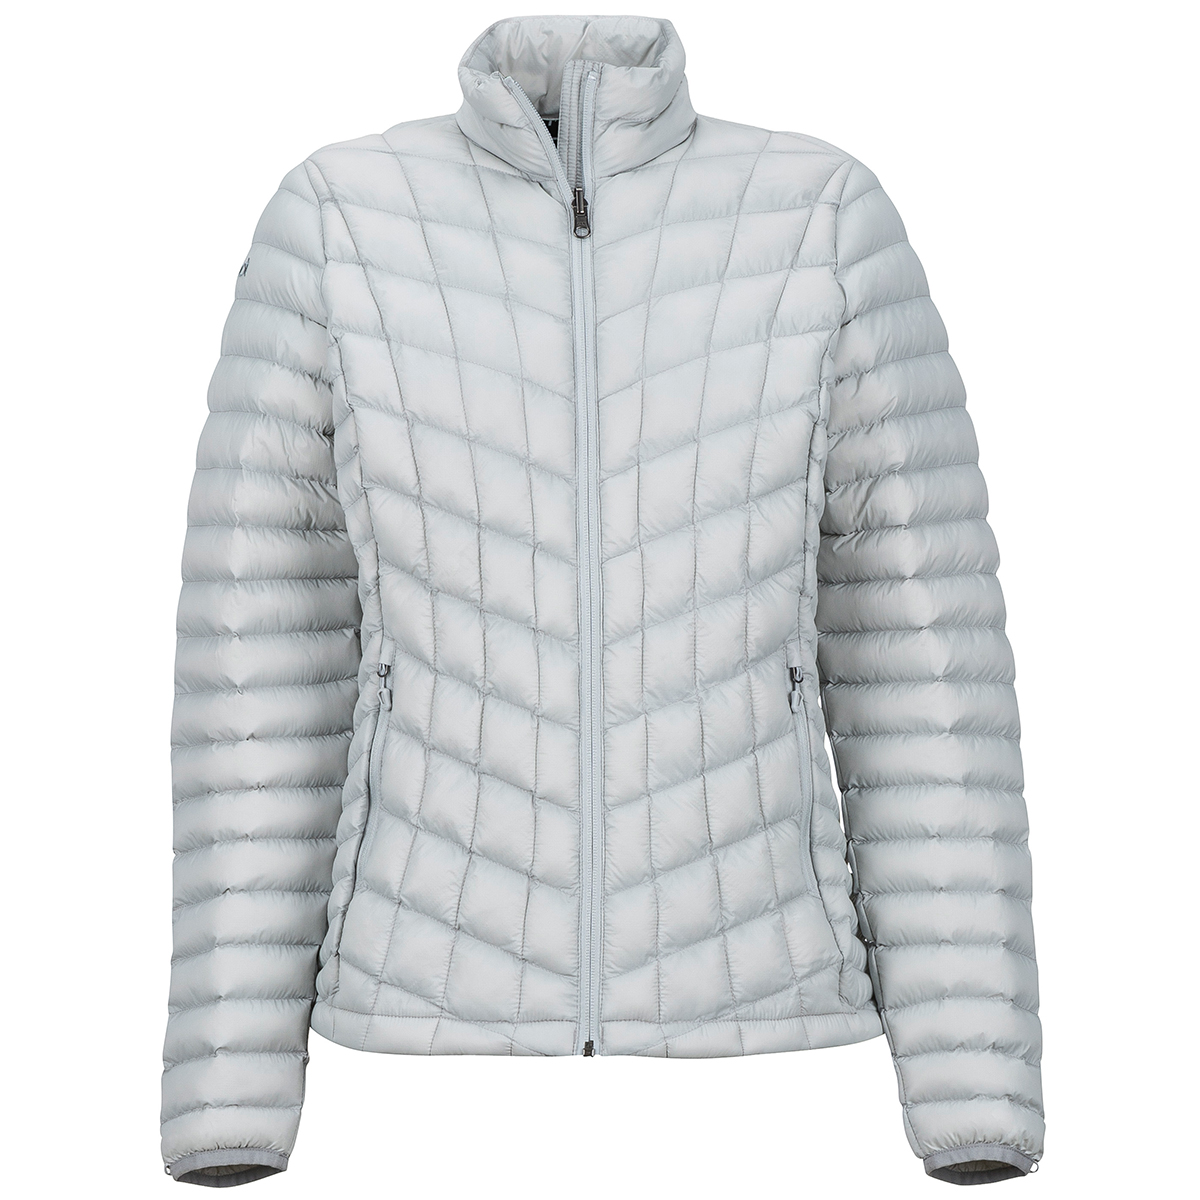 Marmot Women's Featherless Jacket - White, XS